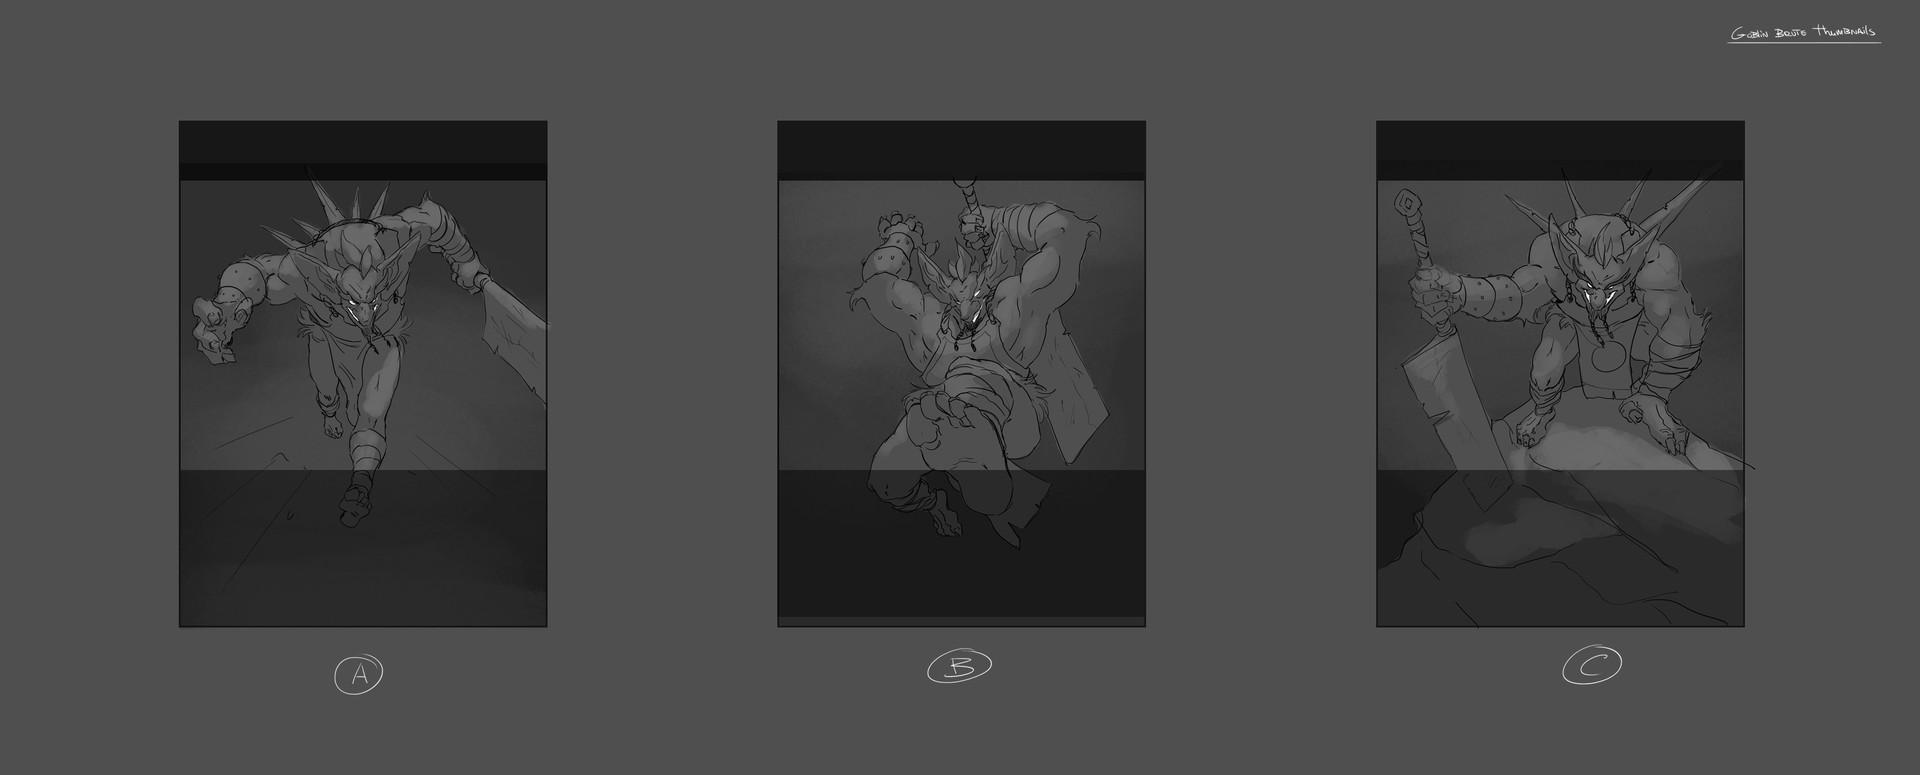 Ricardo coelho goblin brute thumbnails 01